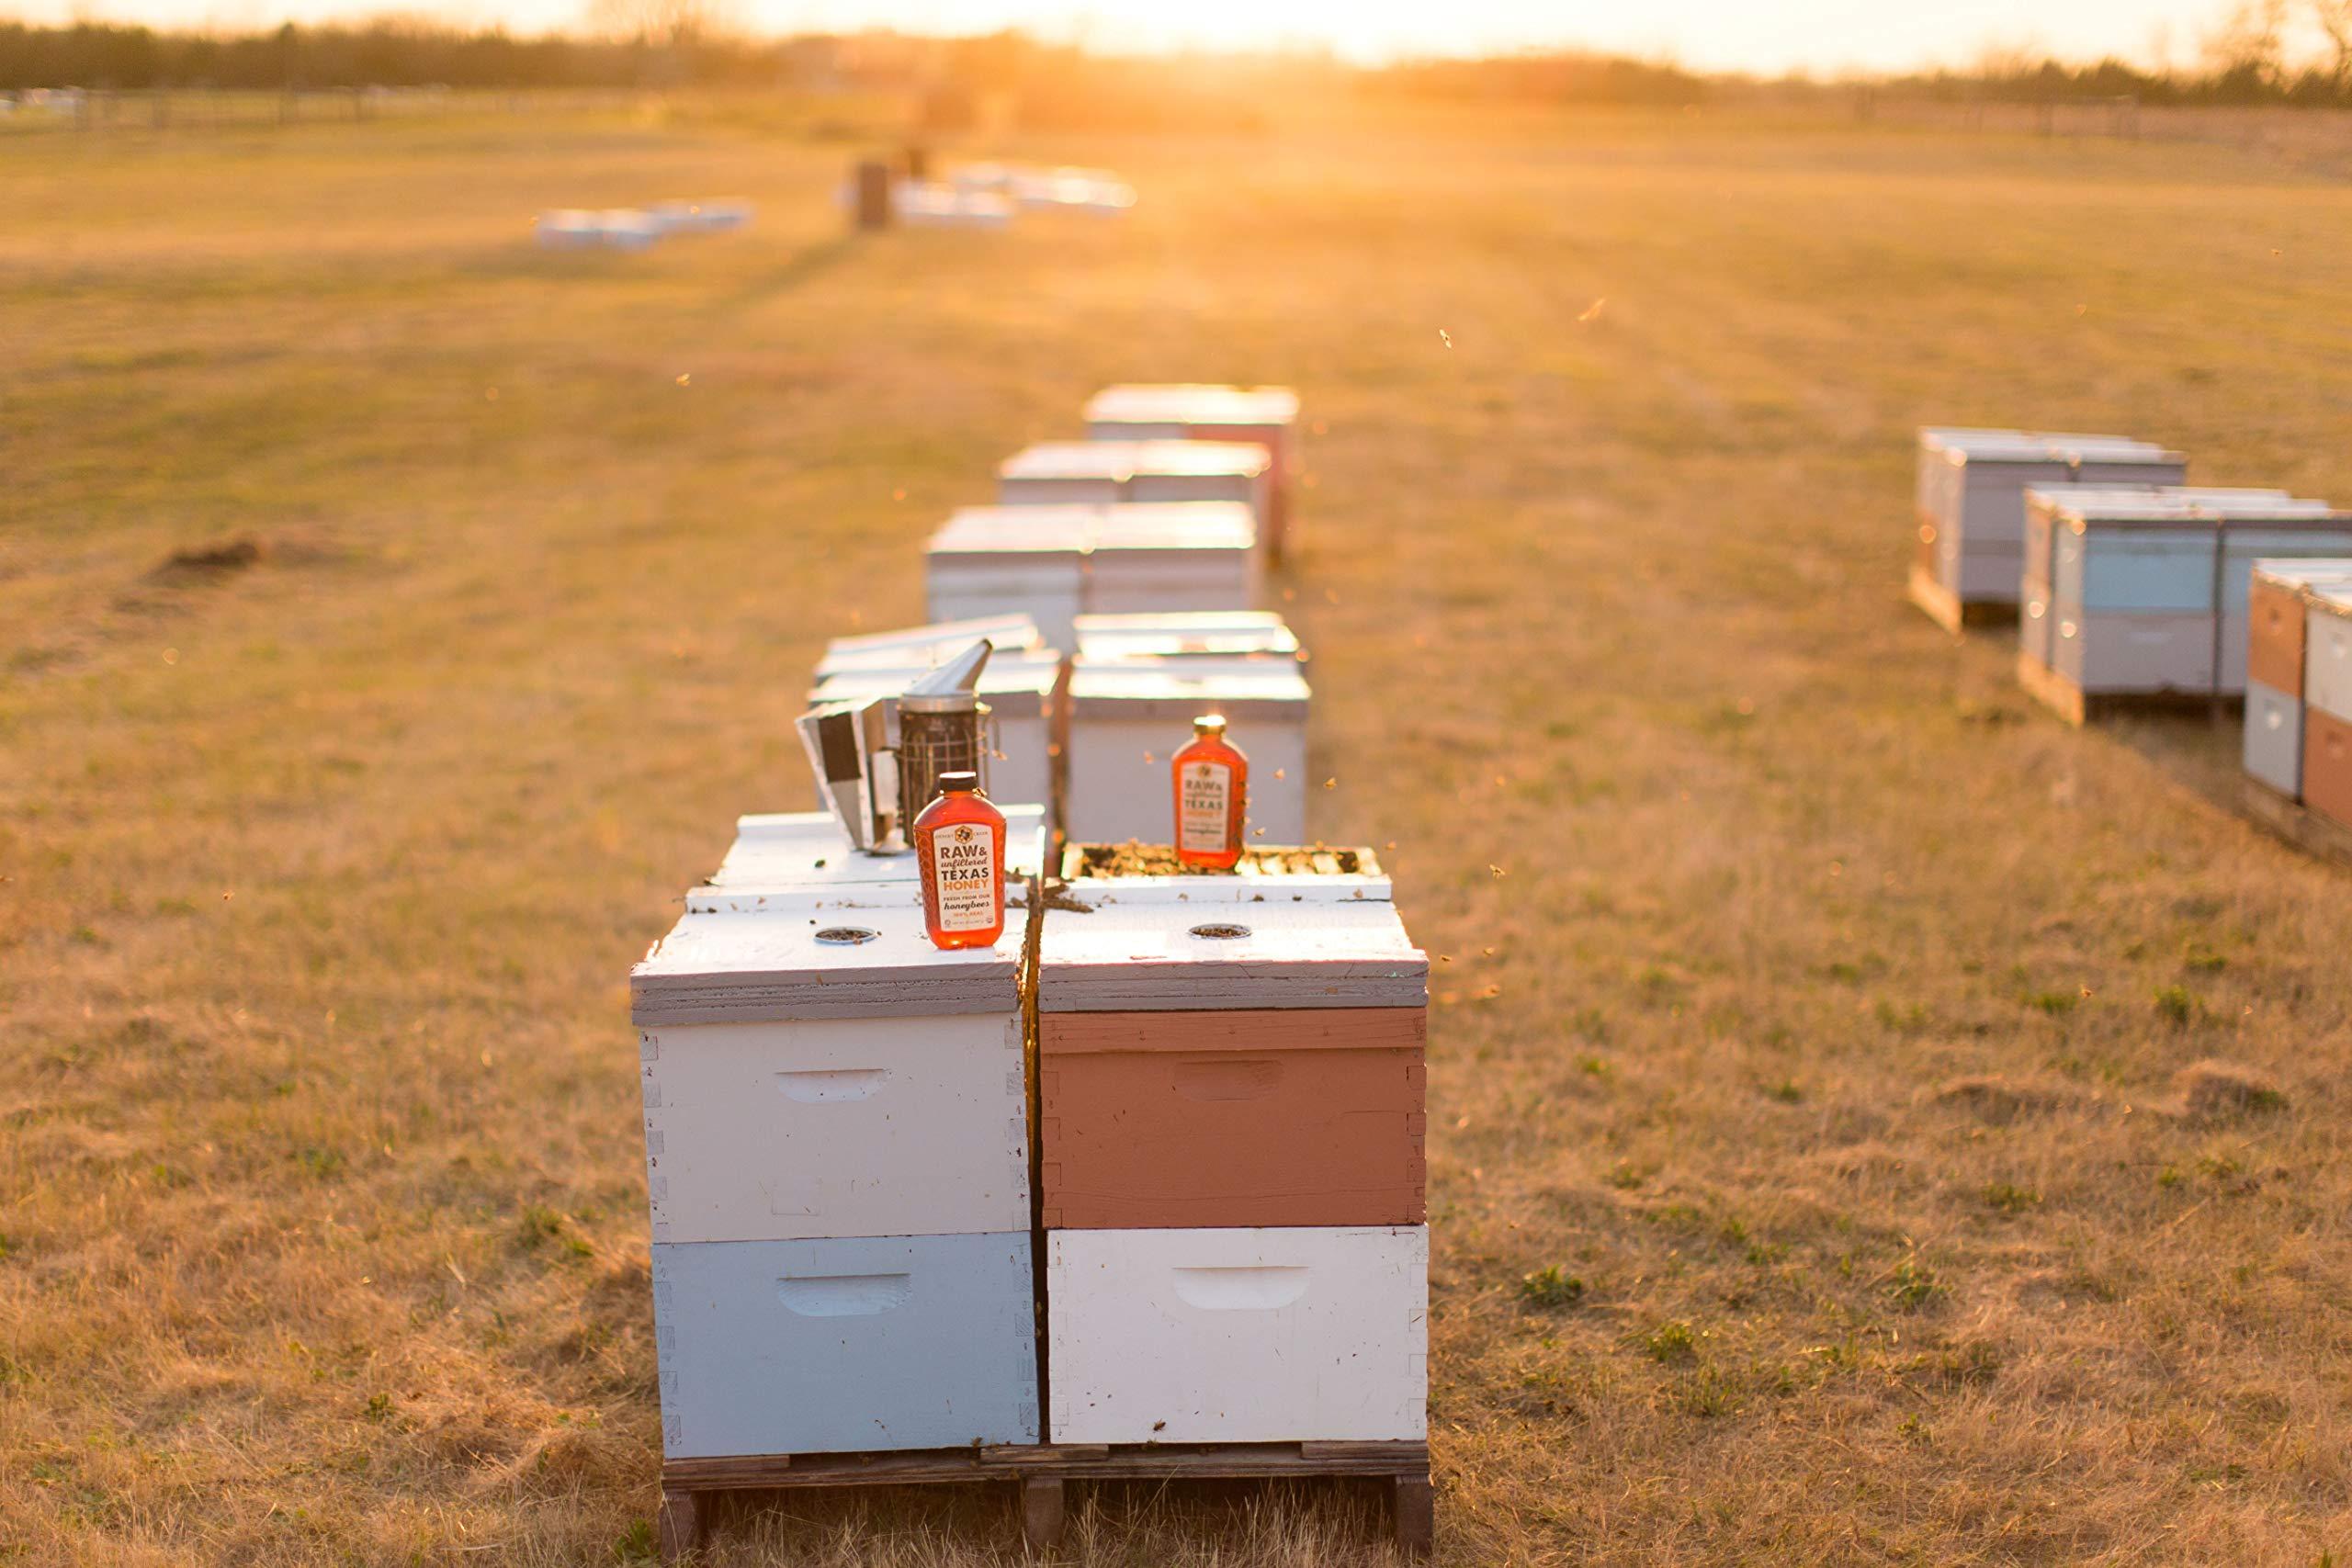 Raw, Unfiltered, Unpasteurized Texas Honey by Desert Creek Honey 5 Gallon (60 lbs) Bulk Bucket Non-GMO, Kosher by Desert Creek Honey (Image #8)